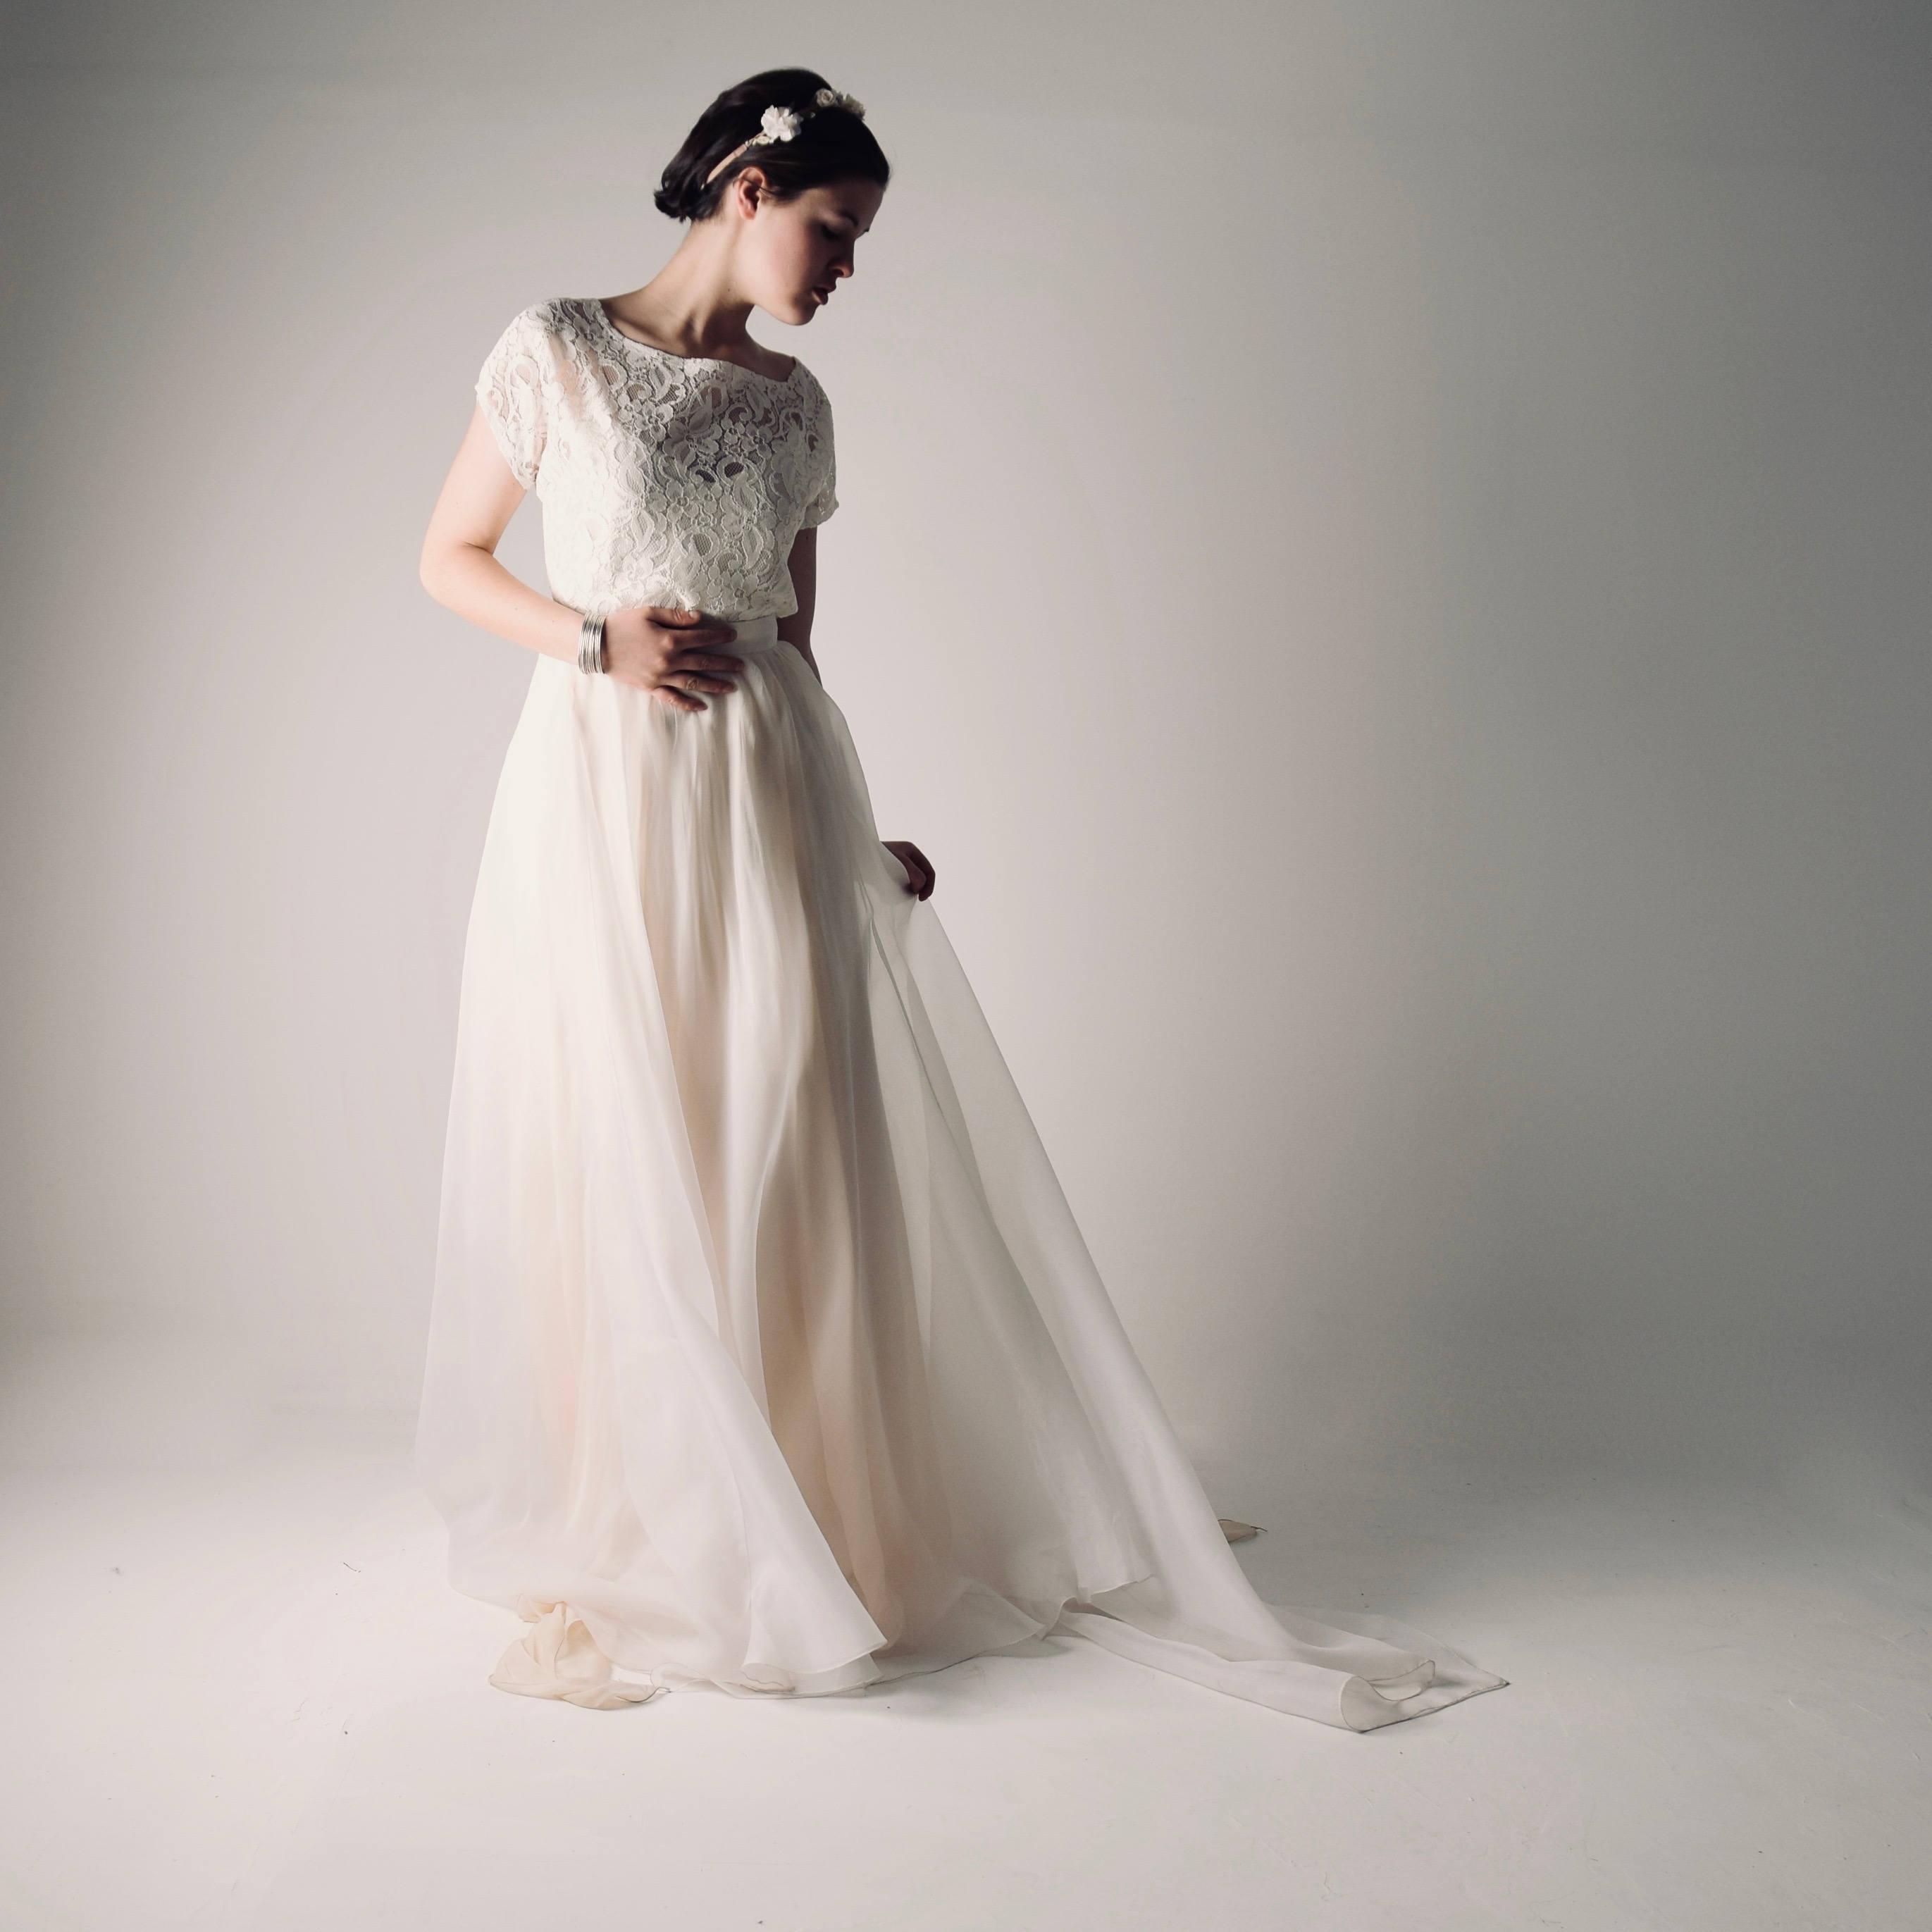 41feddc66037 Bohemian wedding dress separates | Larimeloom Shop online